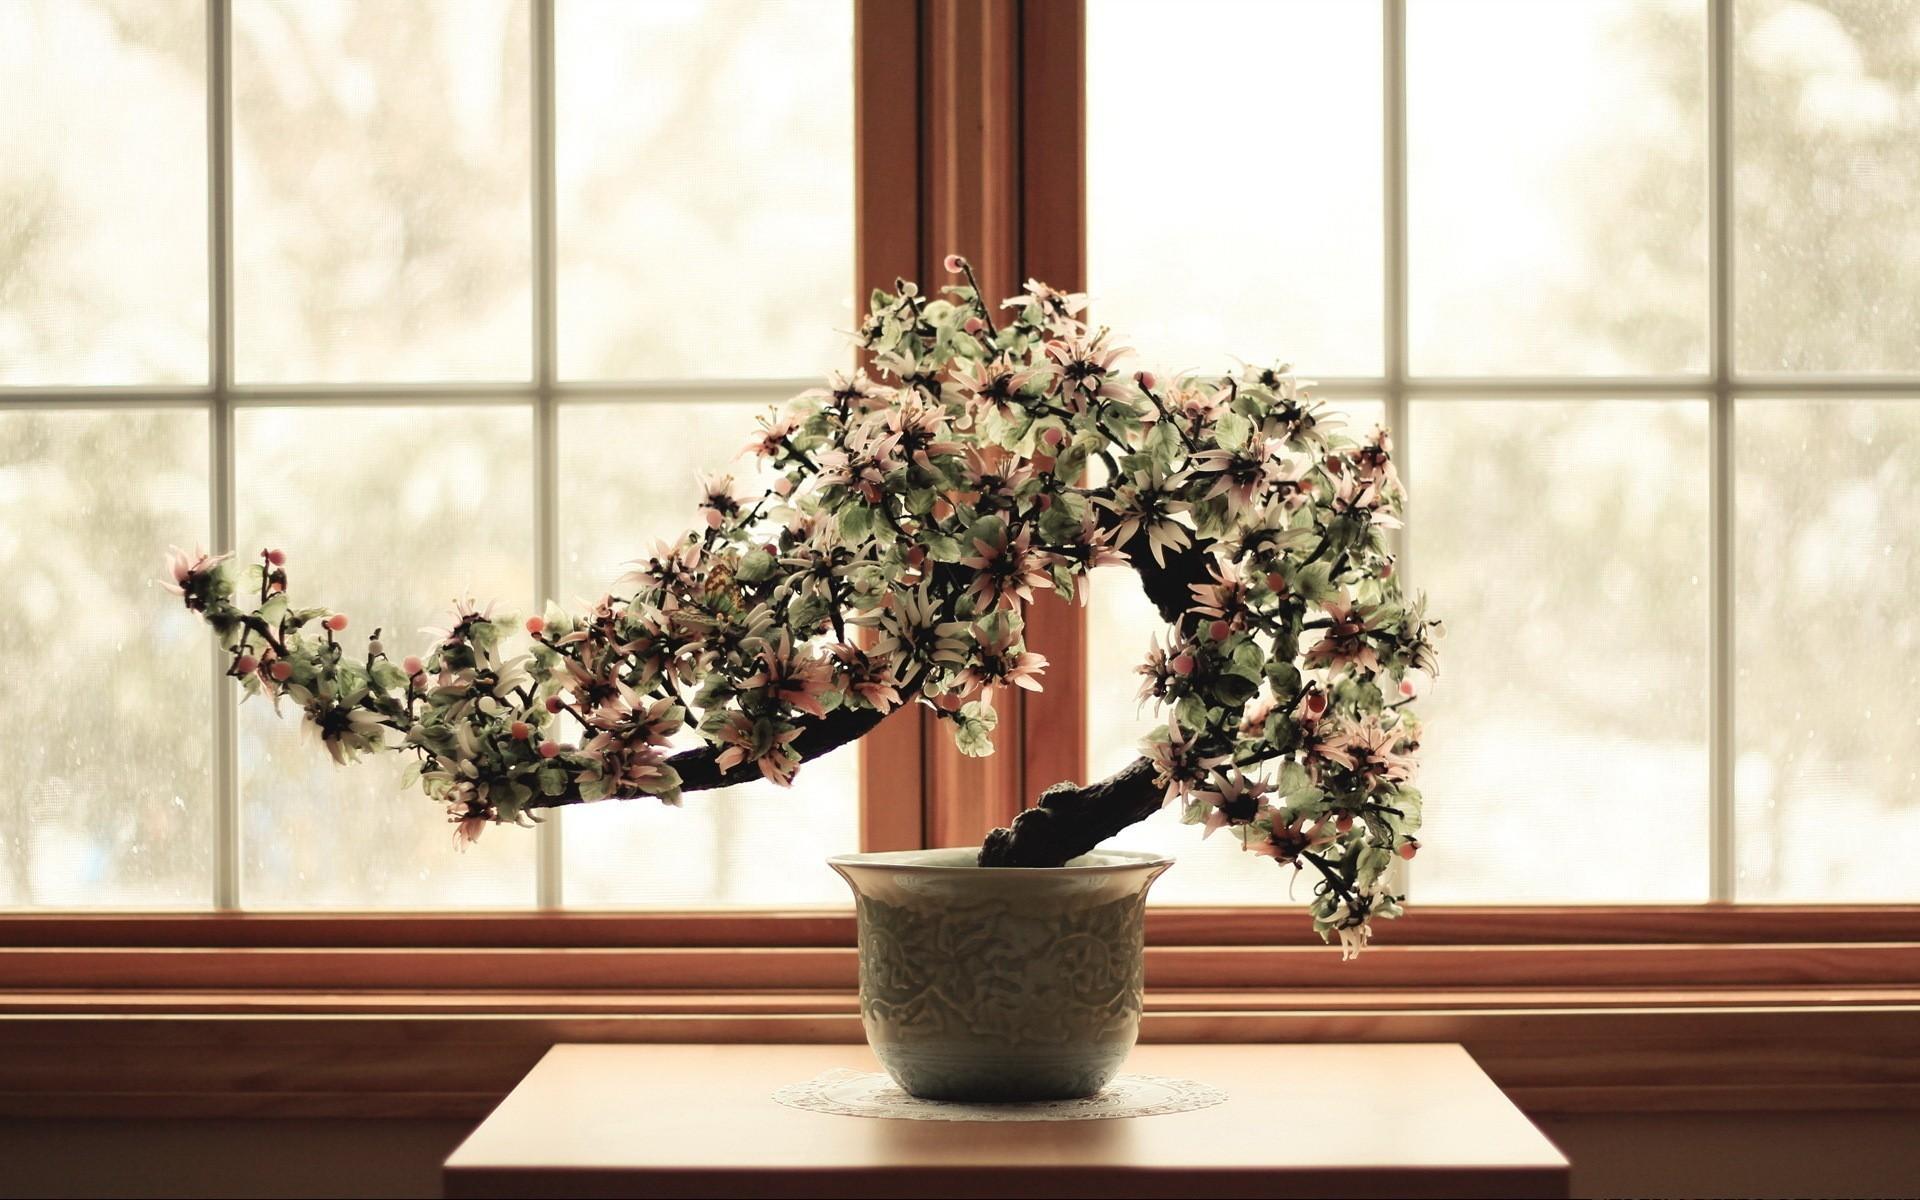 Res: 1920x1200, Flowers bonsai culture wallpaper